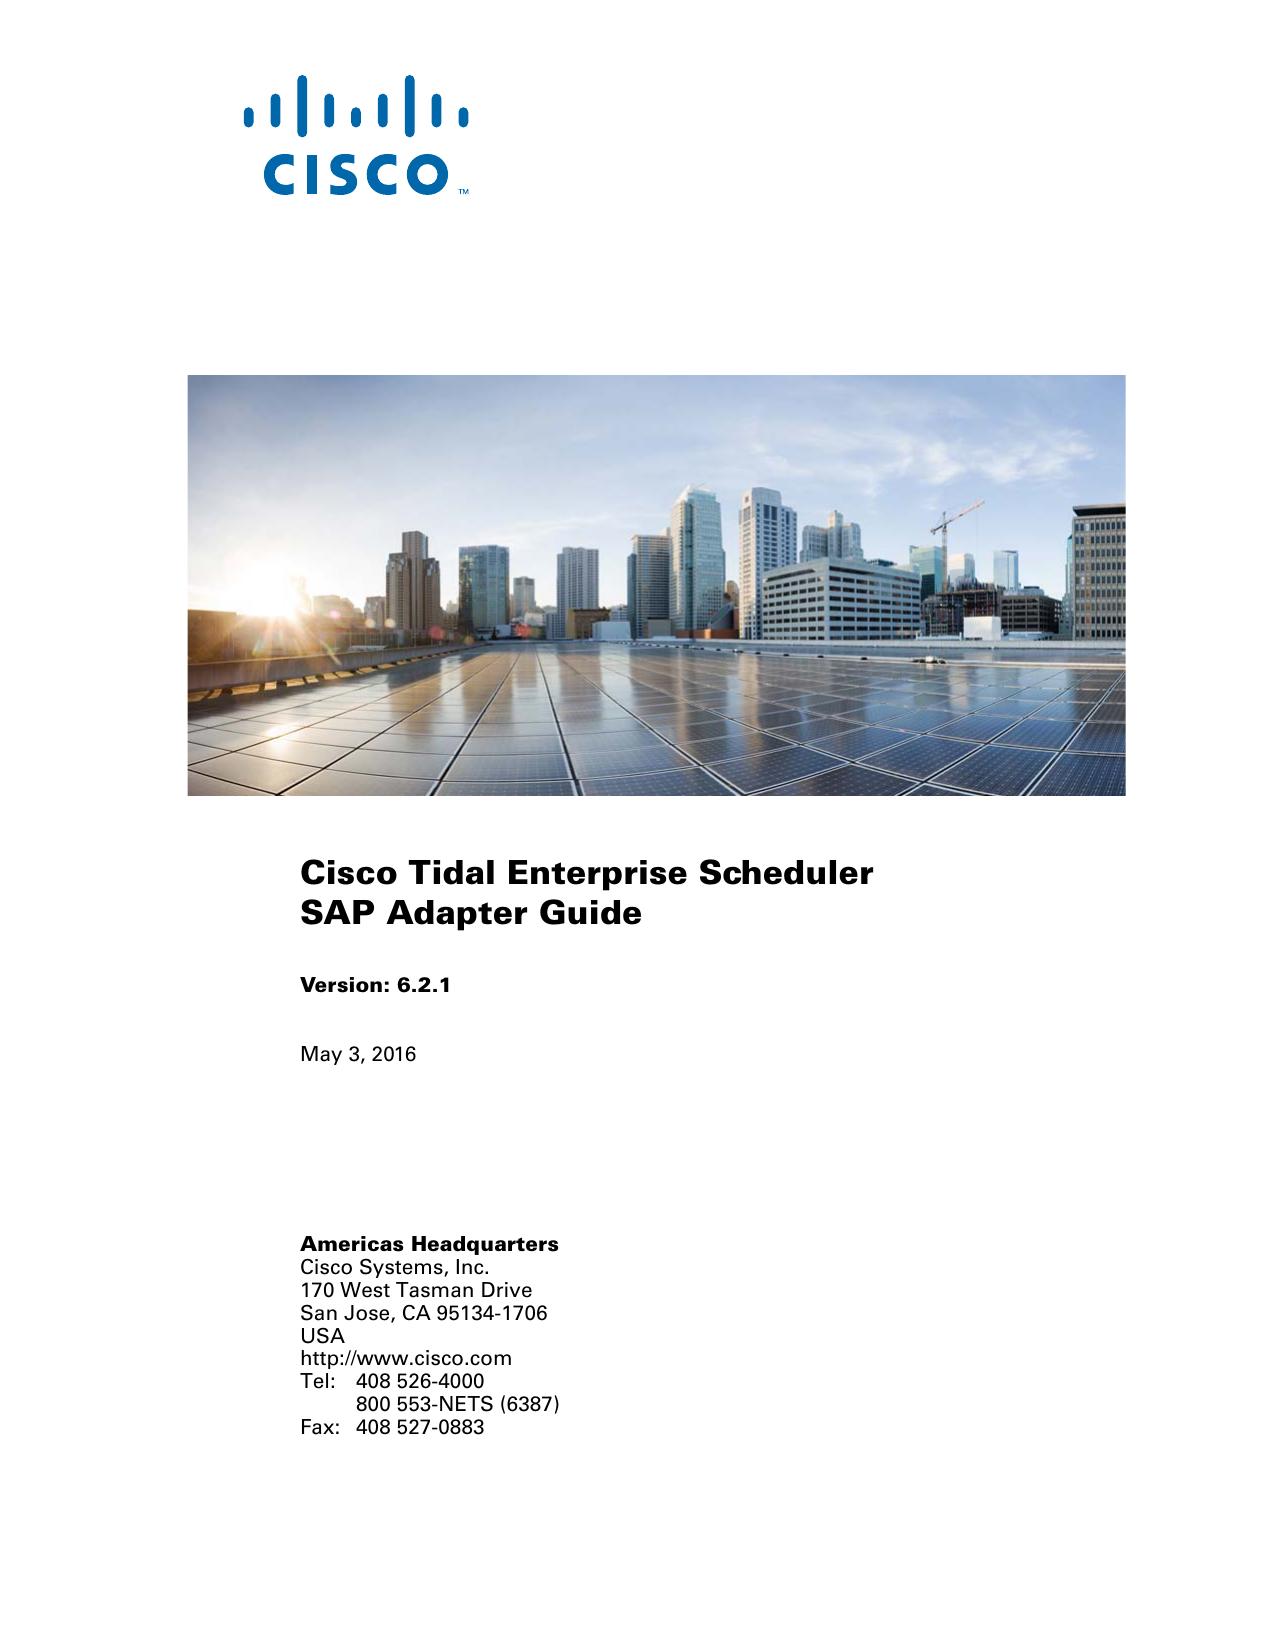 Cisco Tidal Enterprise Scheduler SAP Adapter Guide